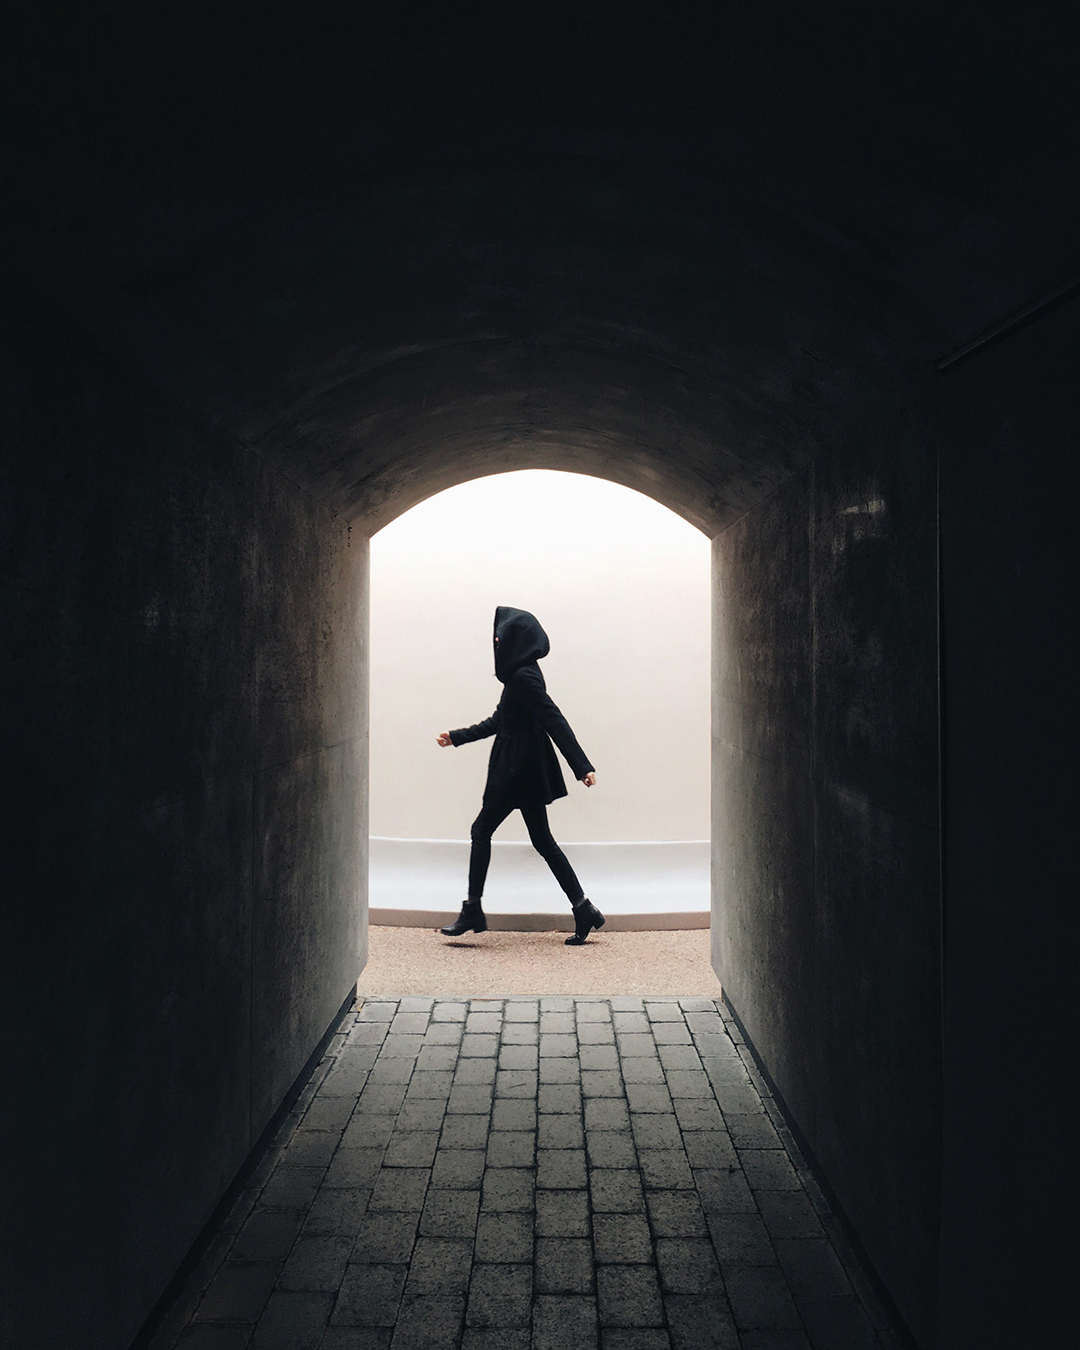 GirlsclubAsia-Photography-Pei-Ketron-Instructor-02